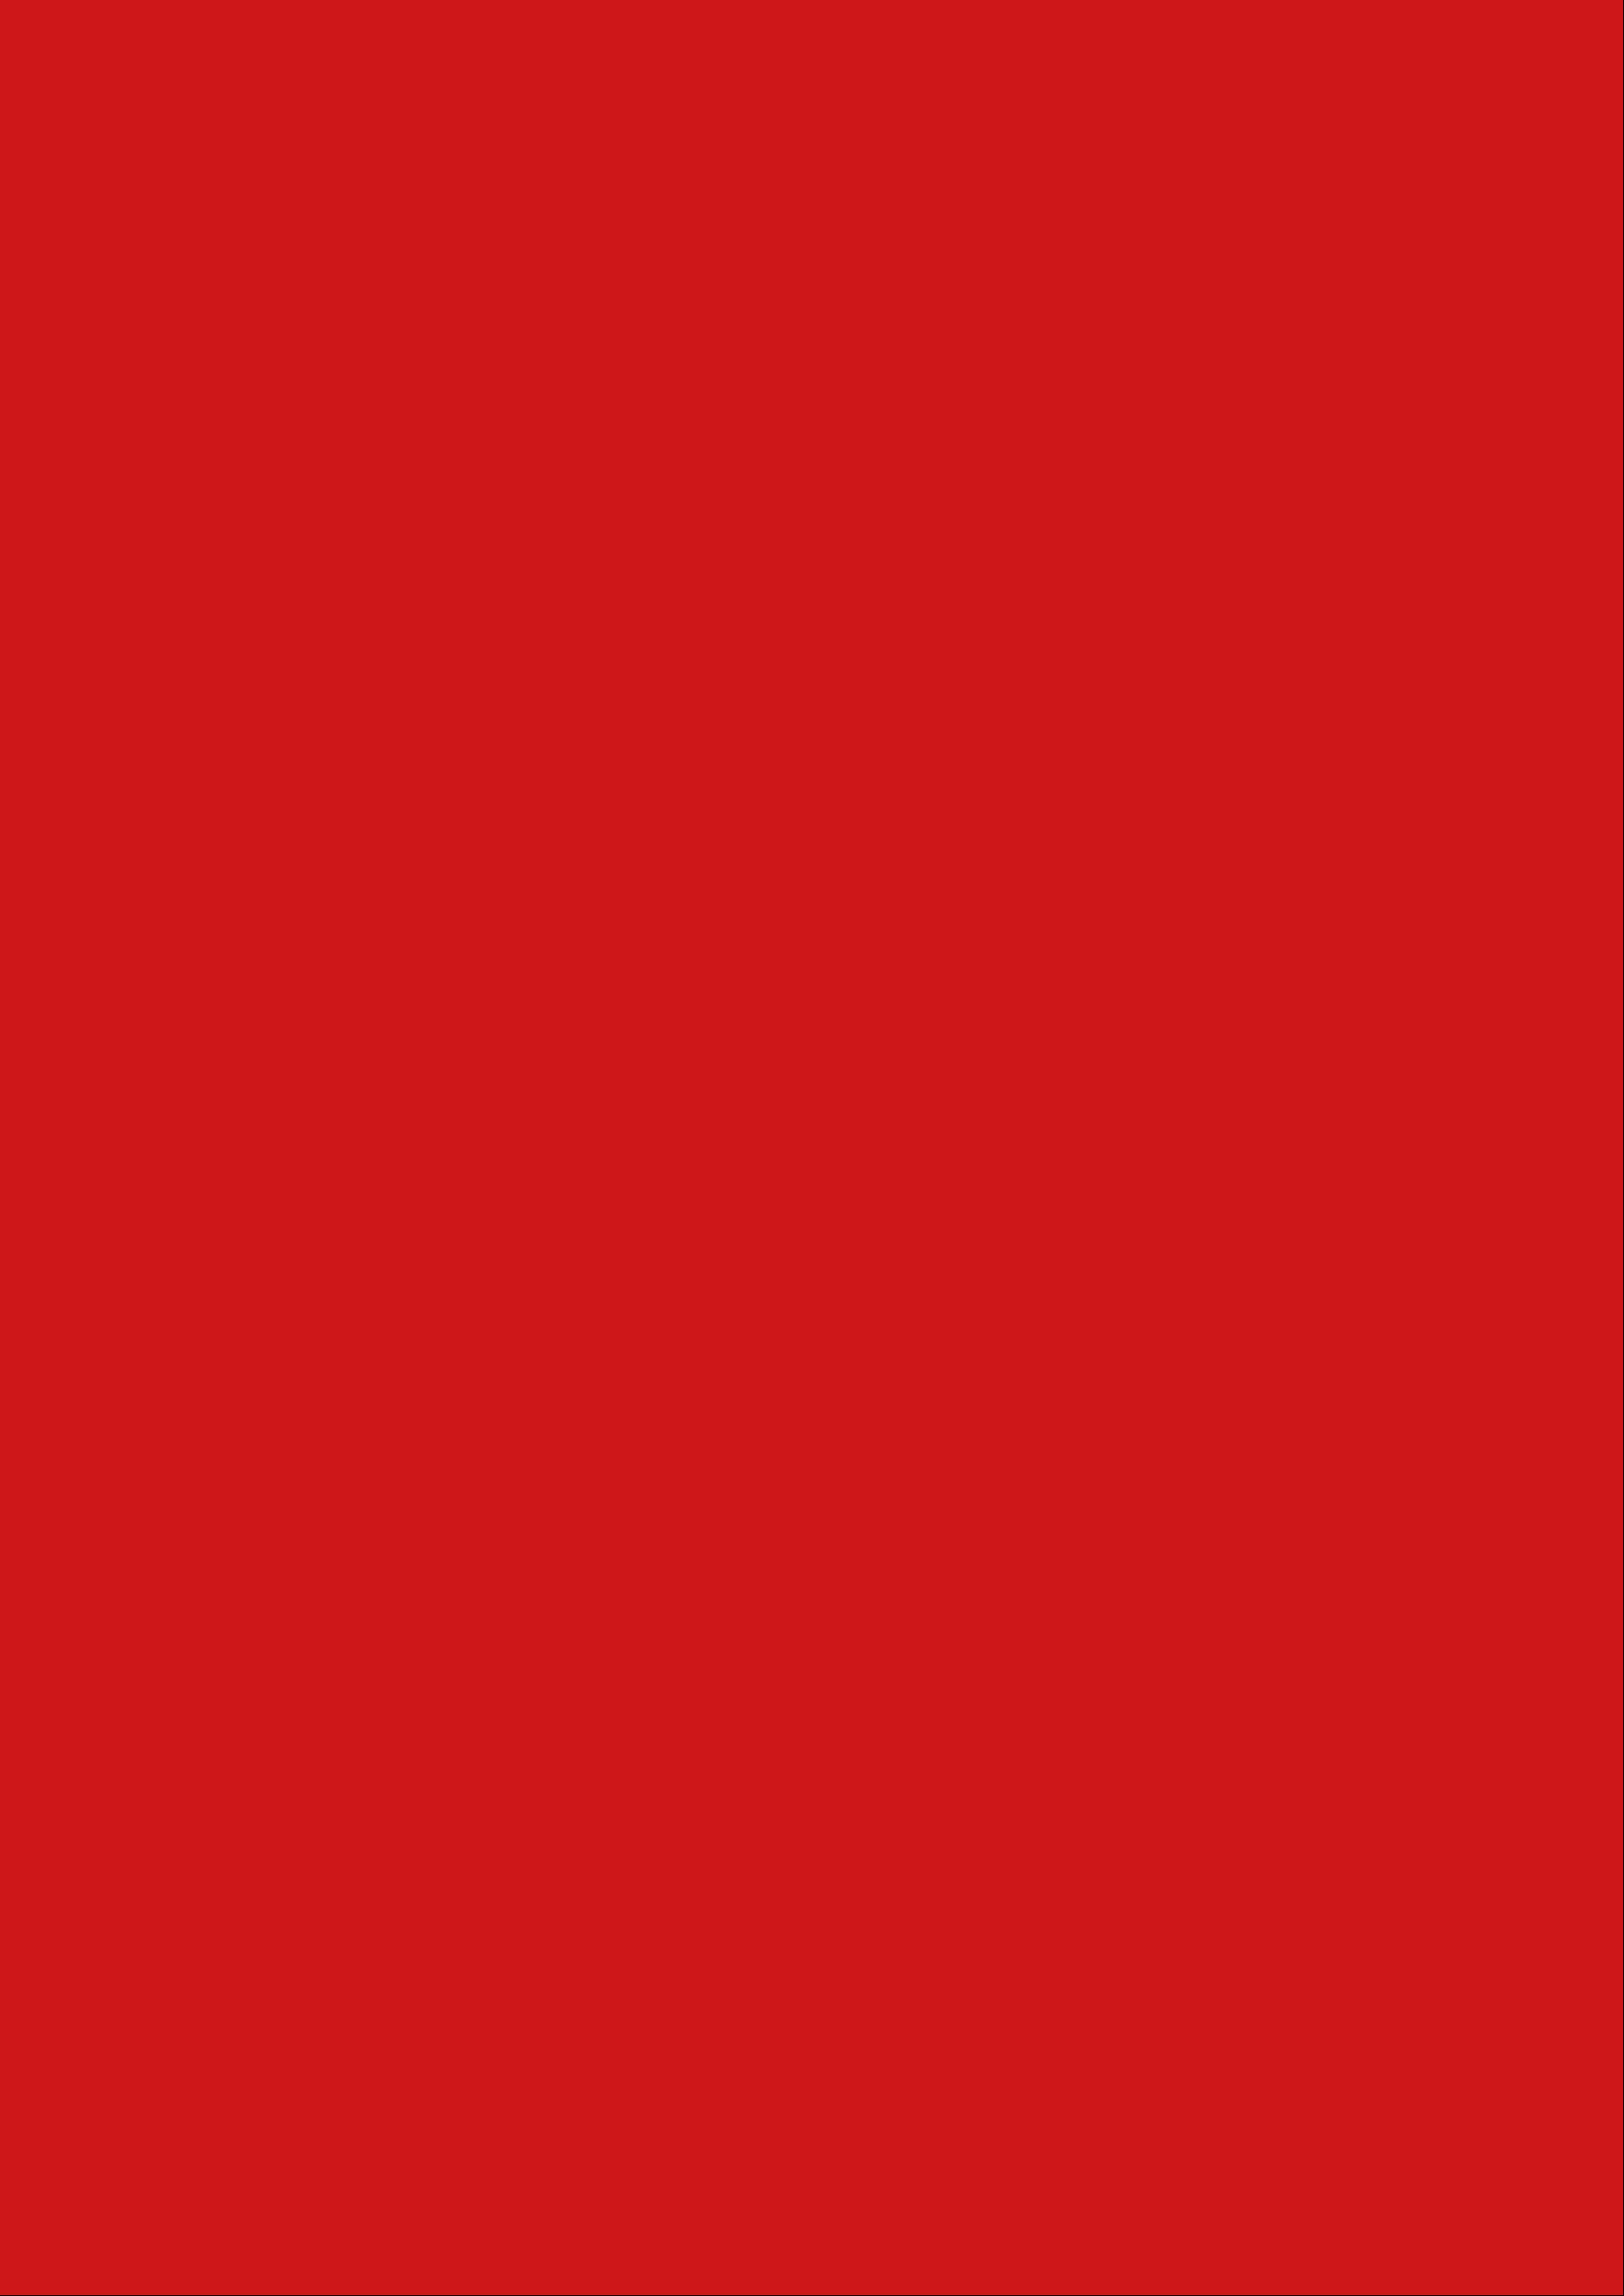 achtergrond rood